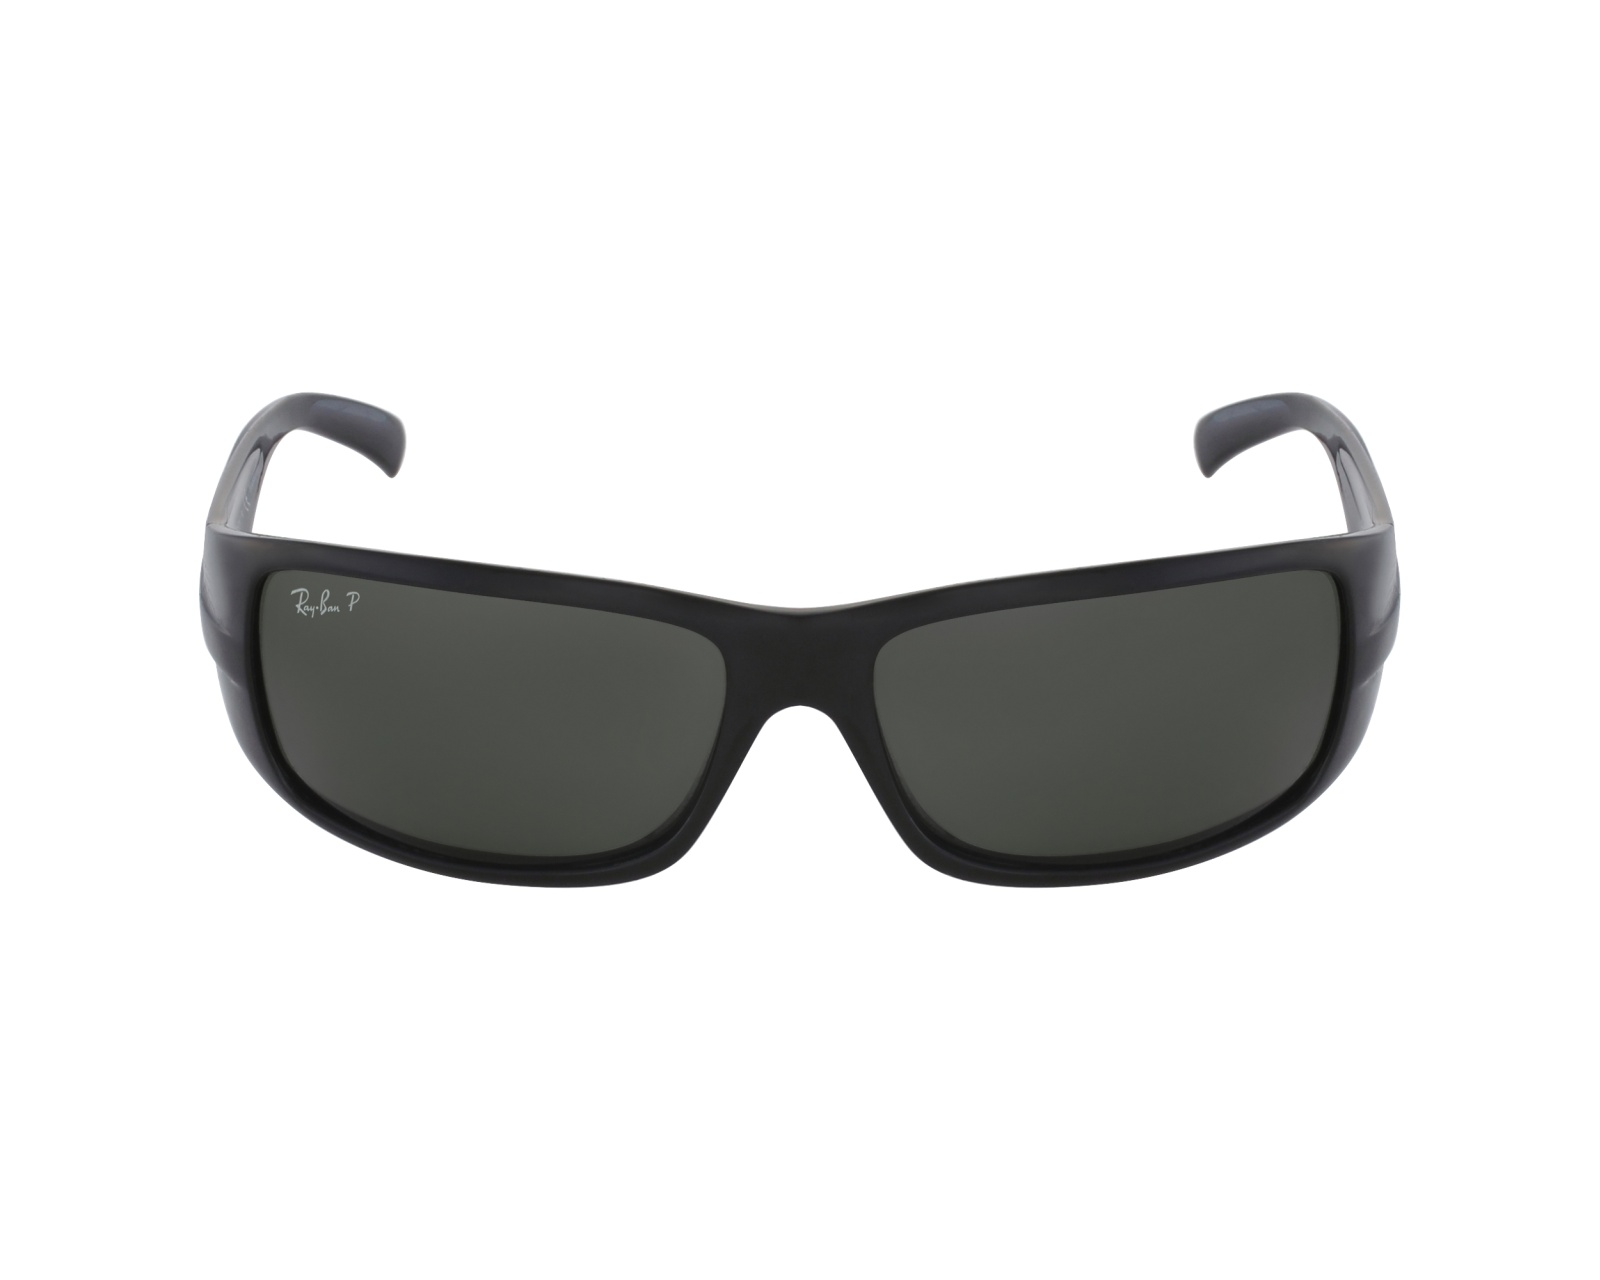 5322847dc7 thumbnail Sunglasses Ray-Ban RB-4057 601 58 - Black profile view